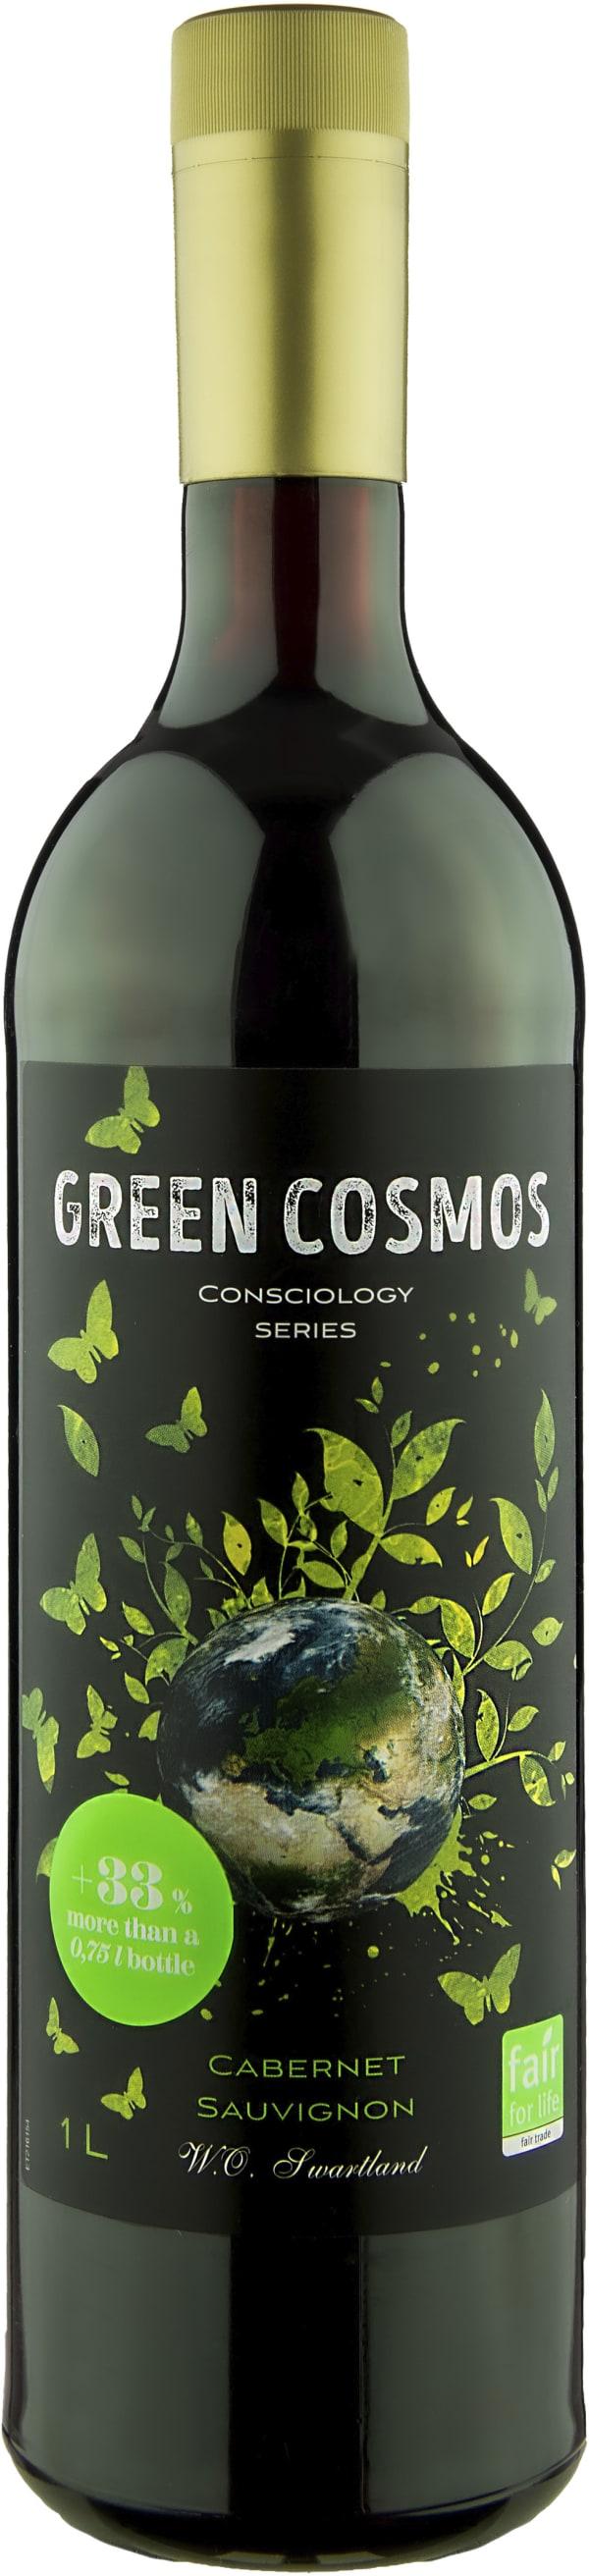 Green Cosmos Consciology Series 2020 plastic bottle